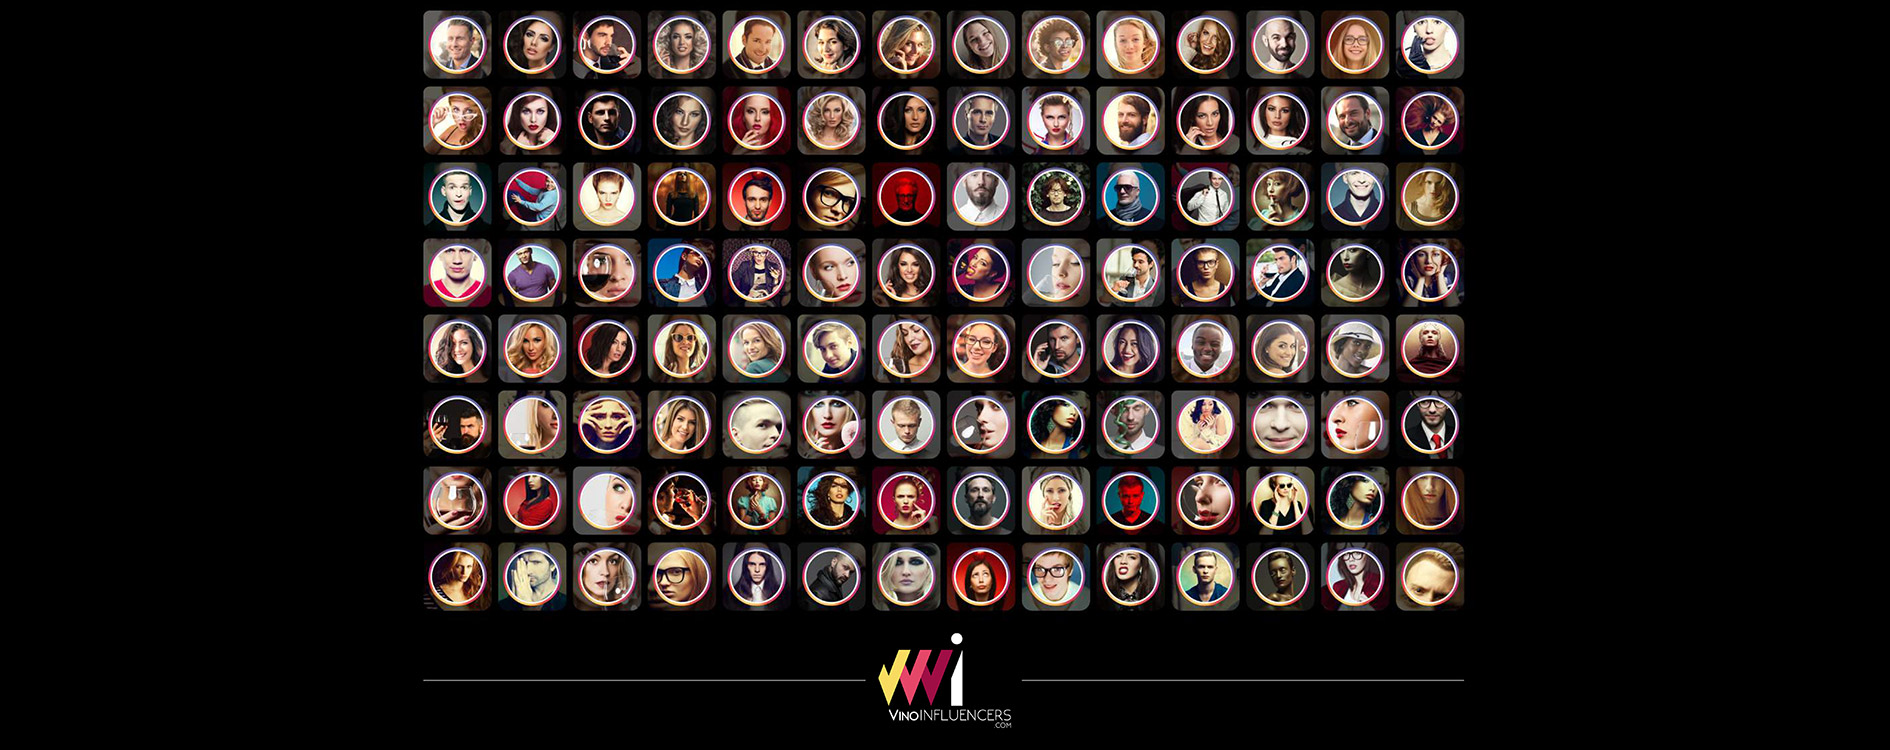 VinoInfluencers - La mayor red mundial de influencers del vino